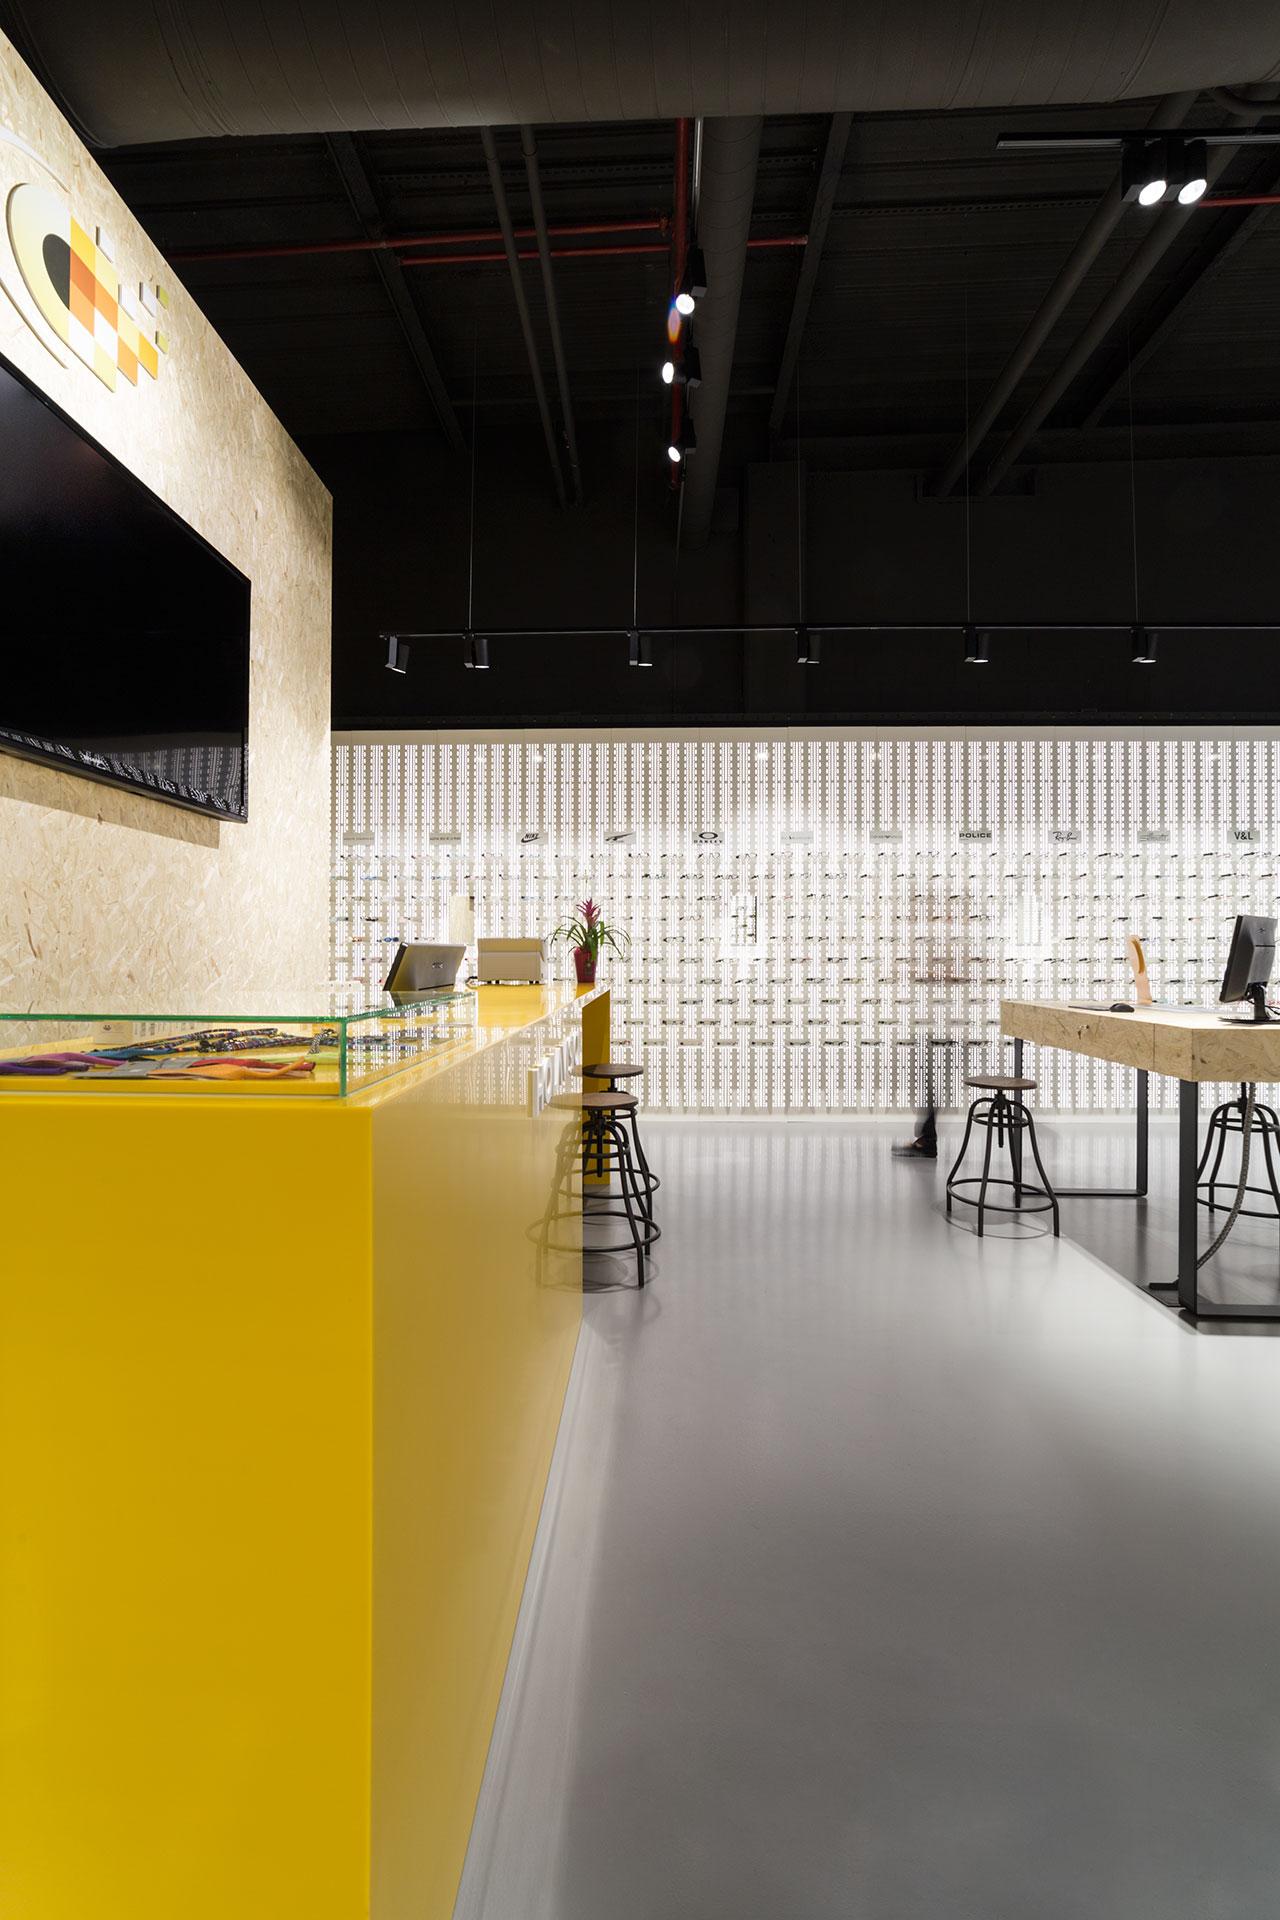 holavisio - san cugat - barcelona - españa. Solid Surface  商业和商务经营场址